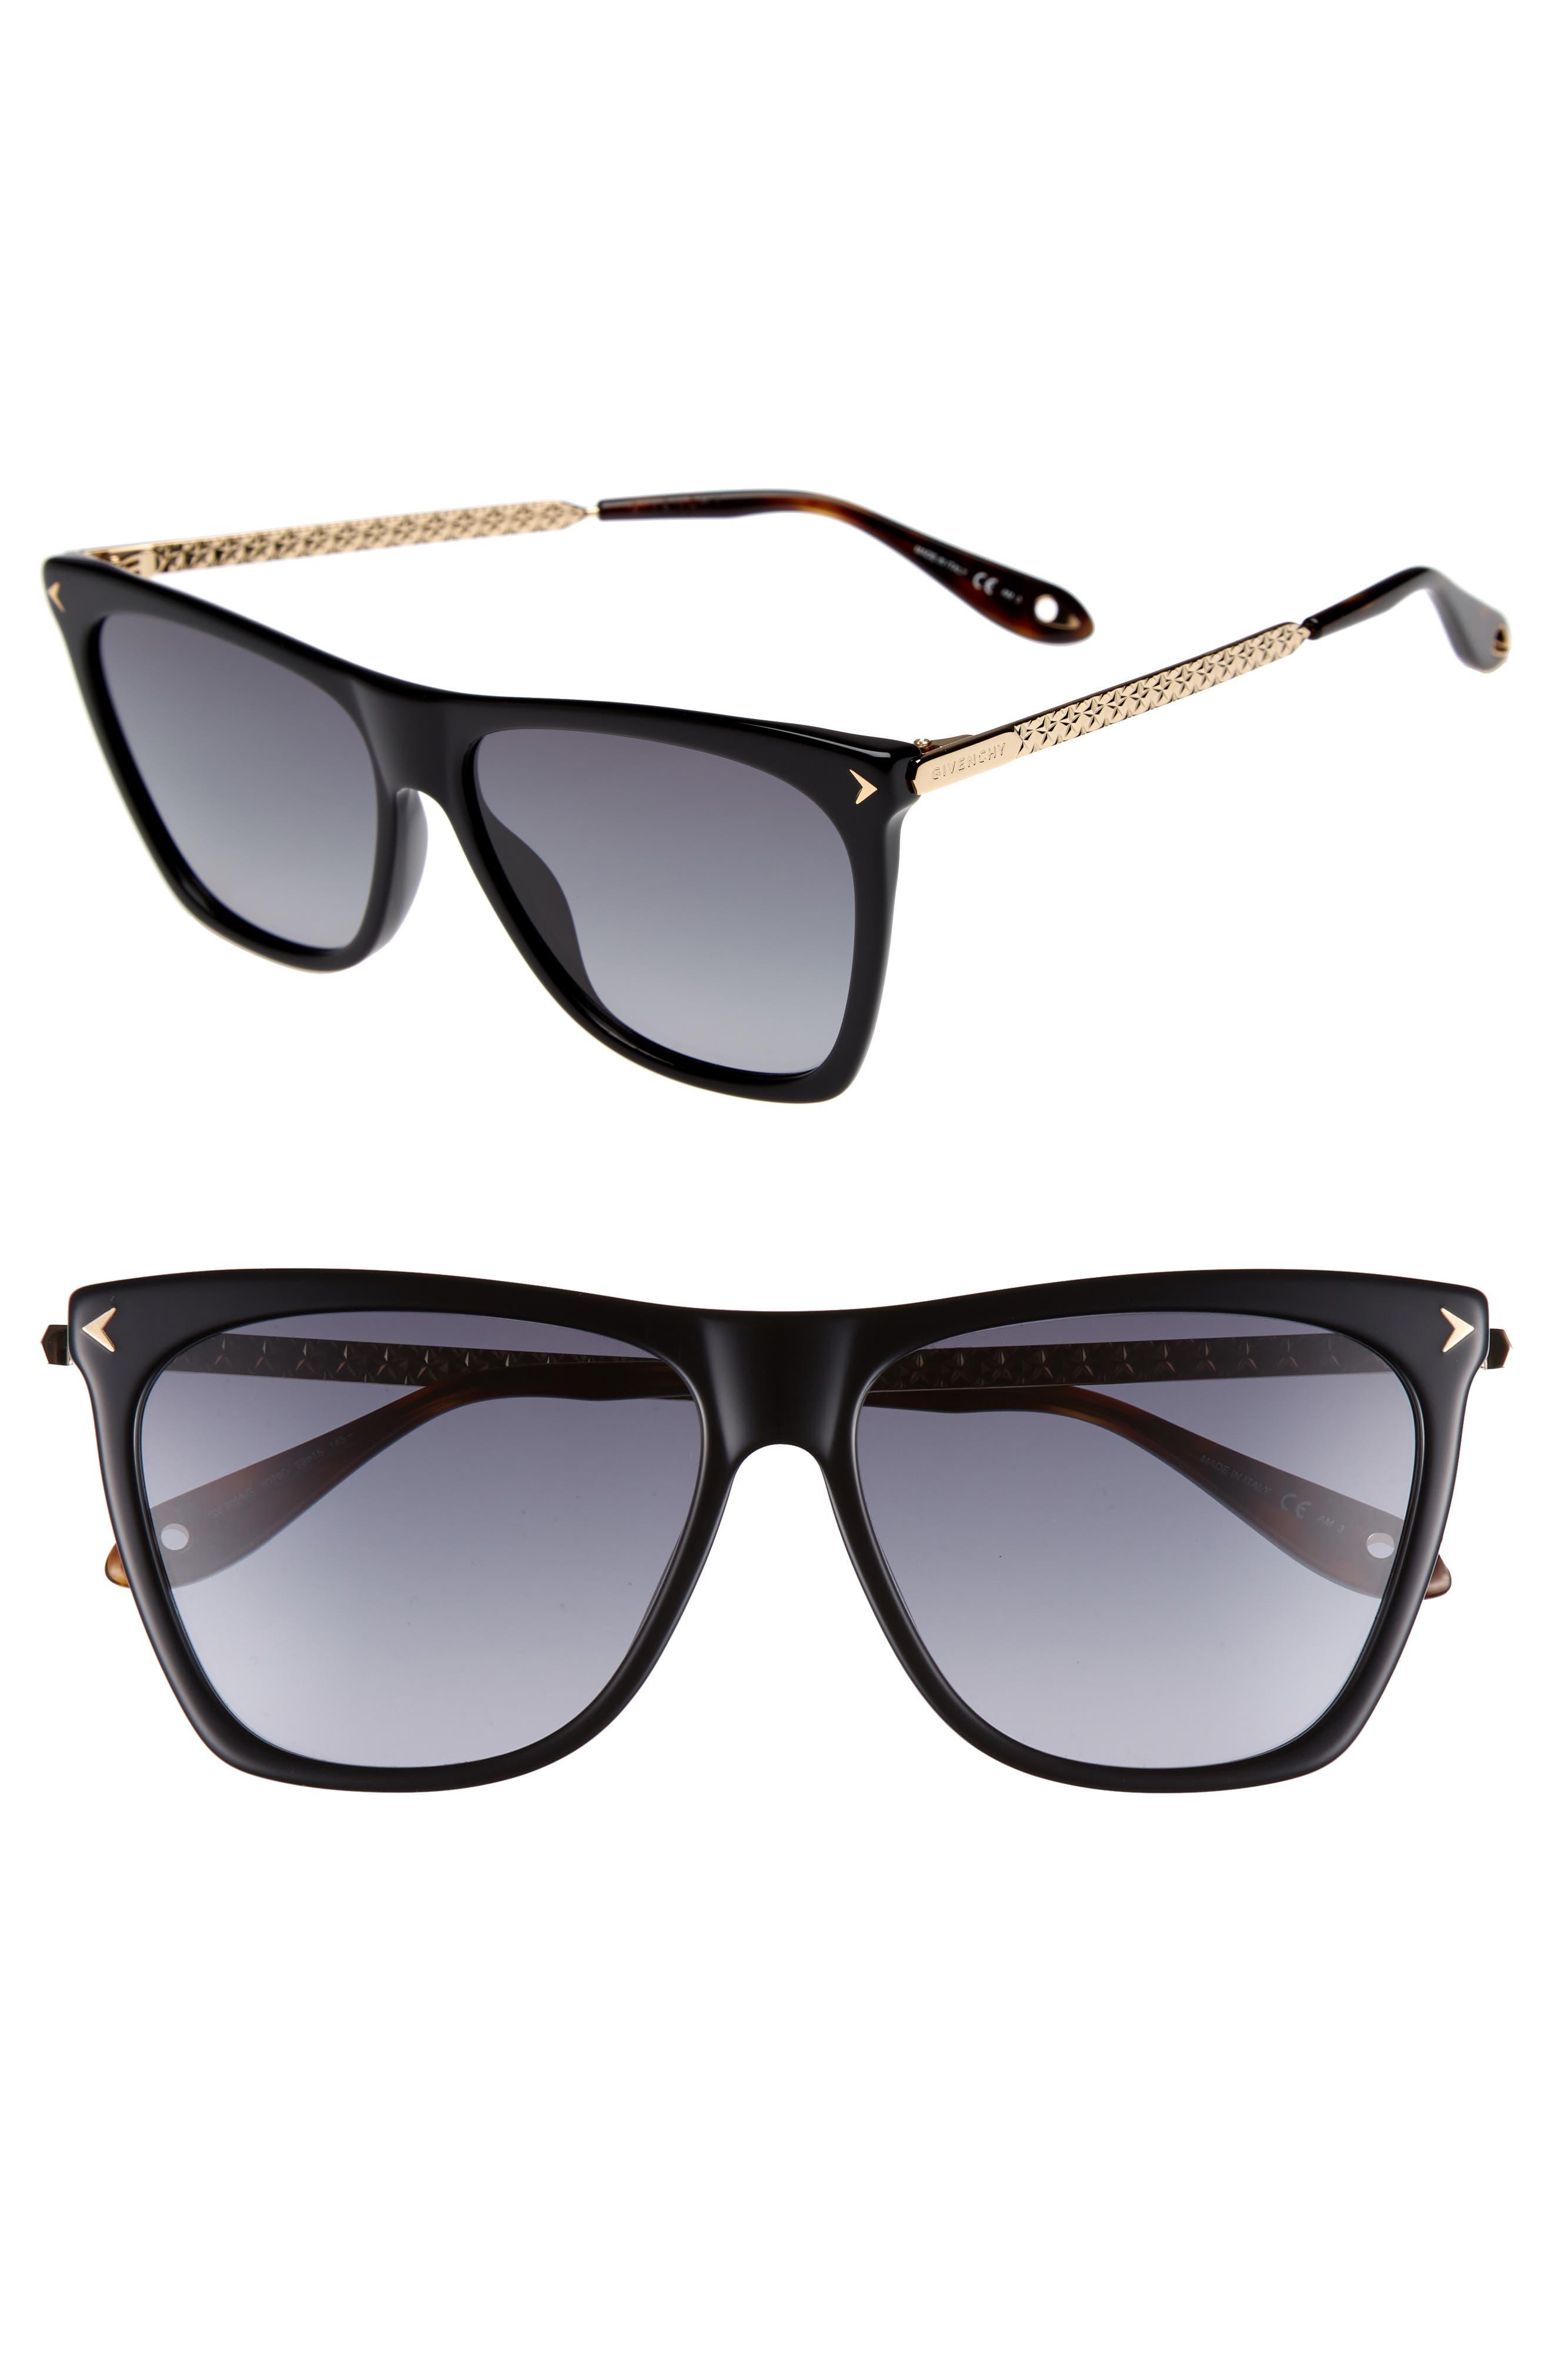 58mm Flat Top Sunglasses,                             Main thumbnail 1, color,                             BLACK